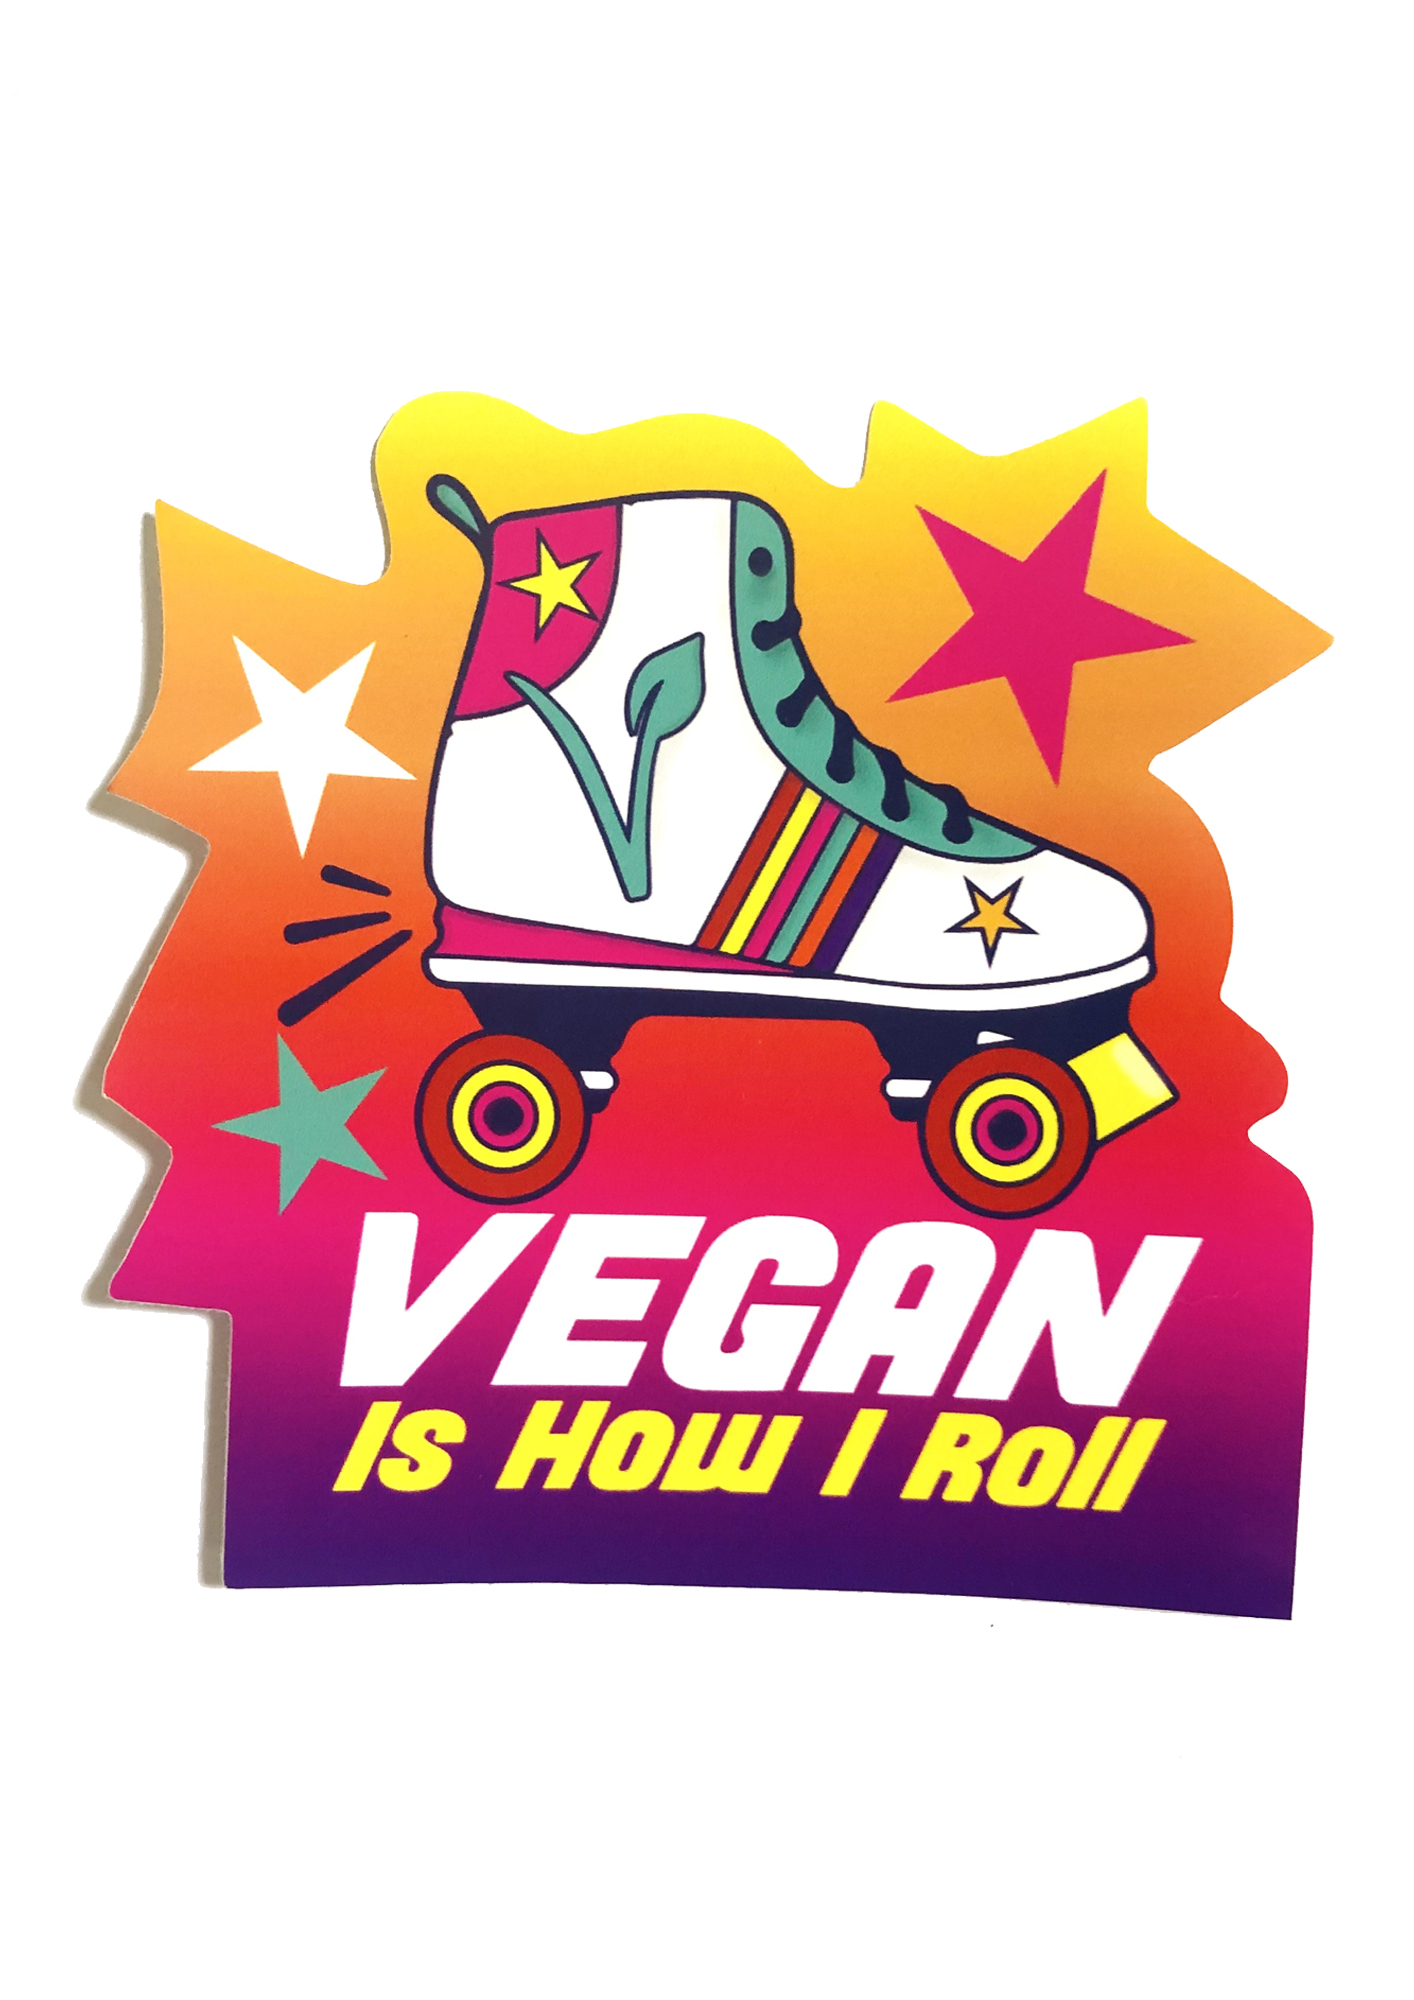 This is How I roll - Vegan Vinyl sticker by Viva La Vegan